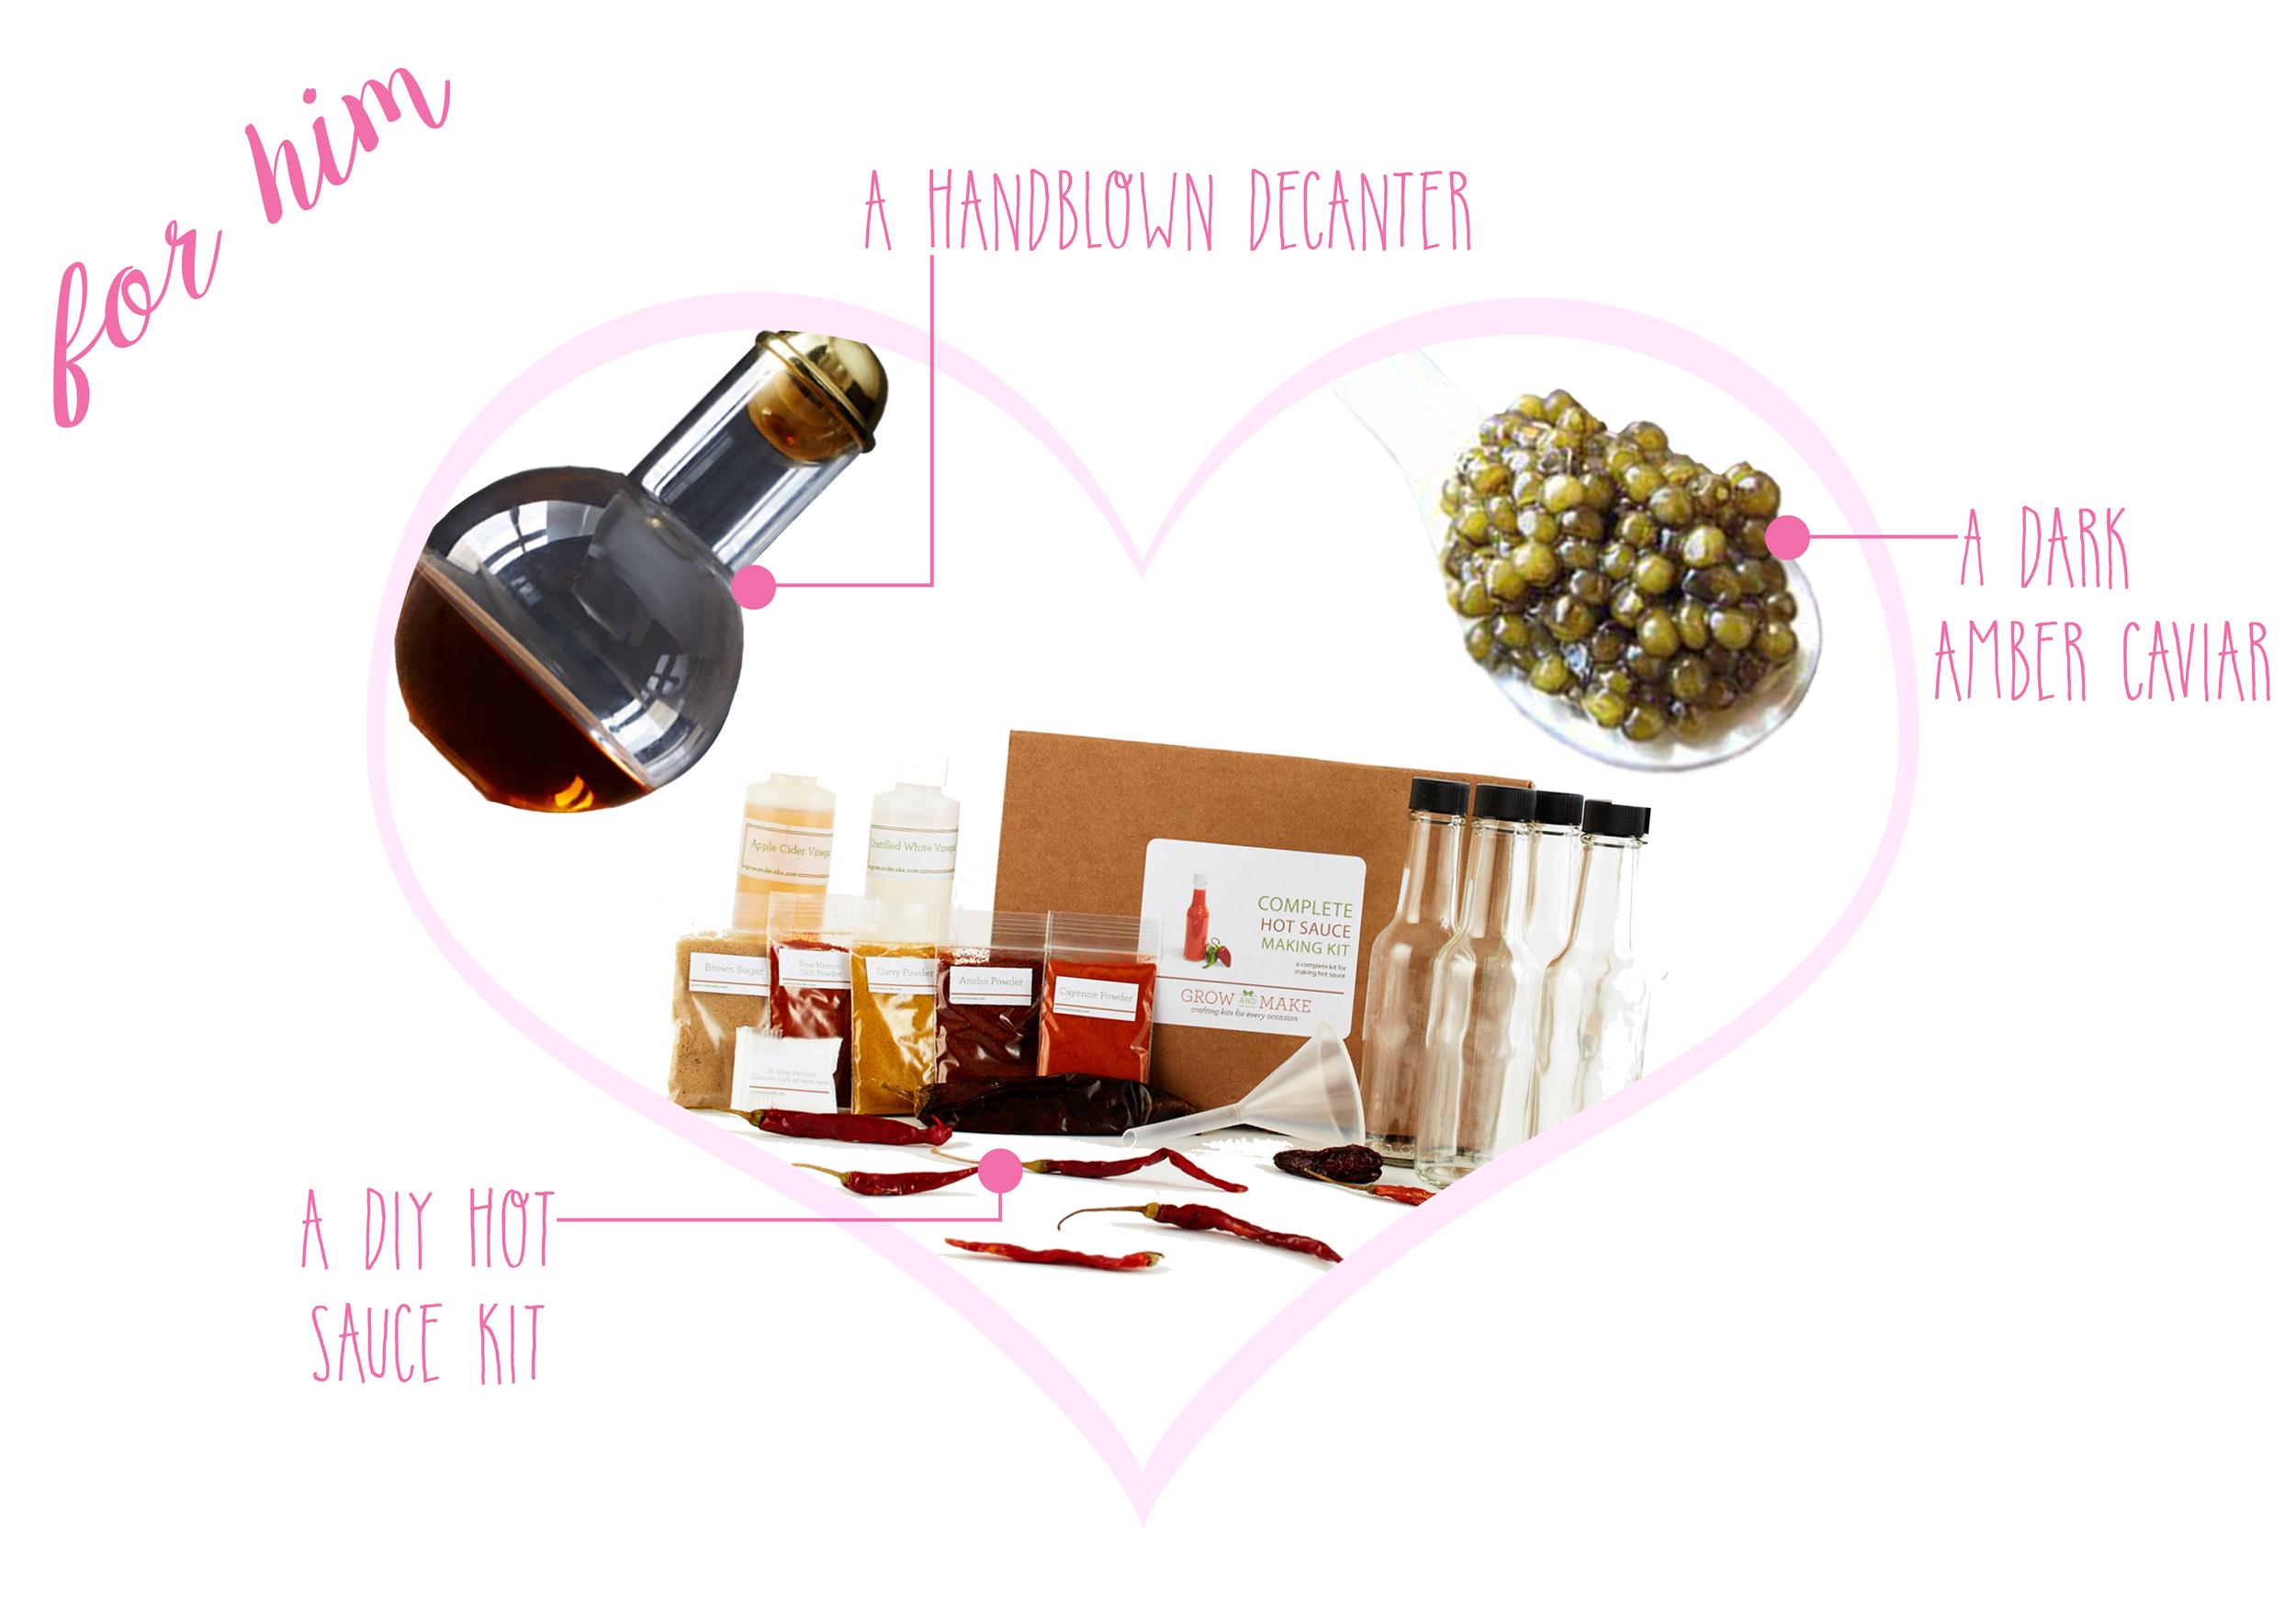 Handblown Decanter  ($225) -  DIY Deluxe Hot Sauce Kit  ($35) -  Osetra Gueldenstaedtii Caviar  ($200 / 50g)